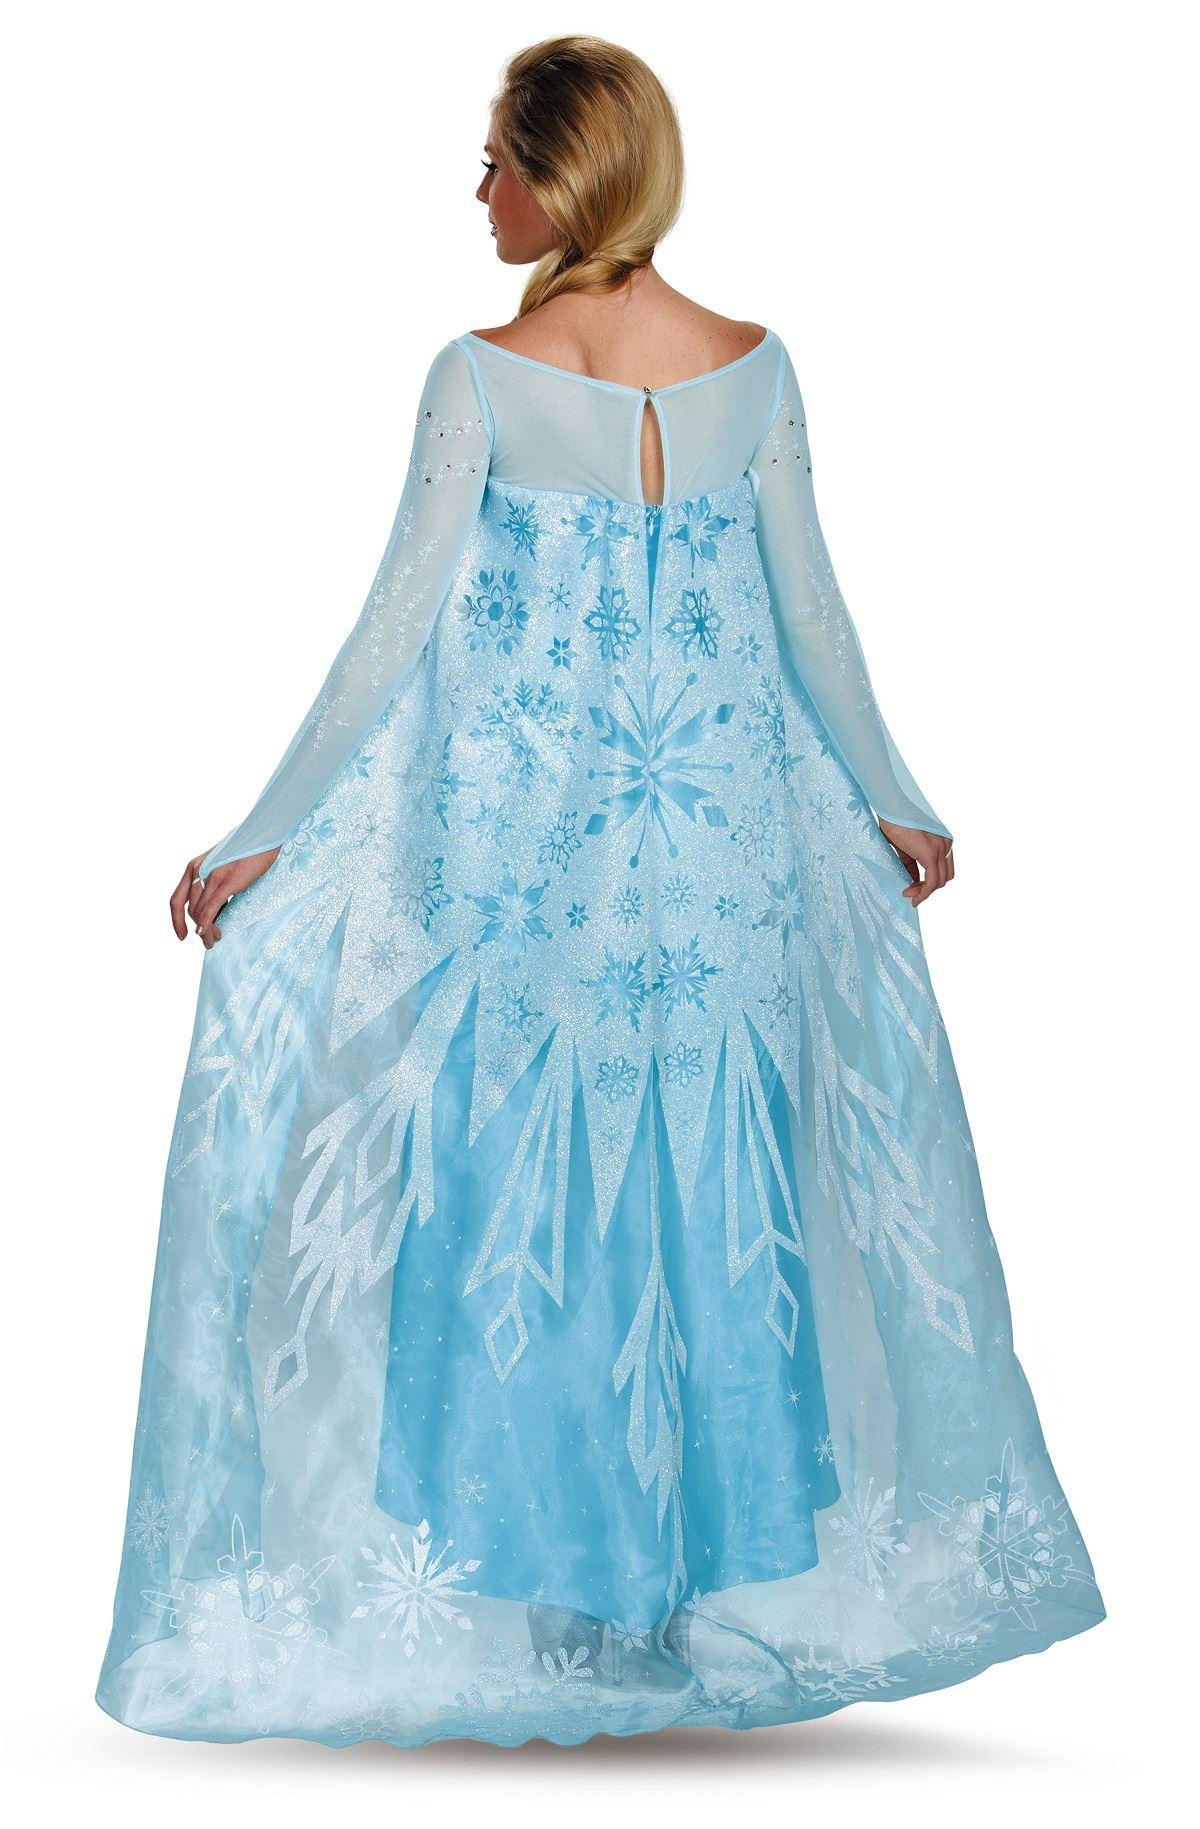 Adult elsa disney princess woman costume the - Costume princesse disney adulte ...